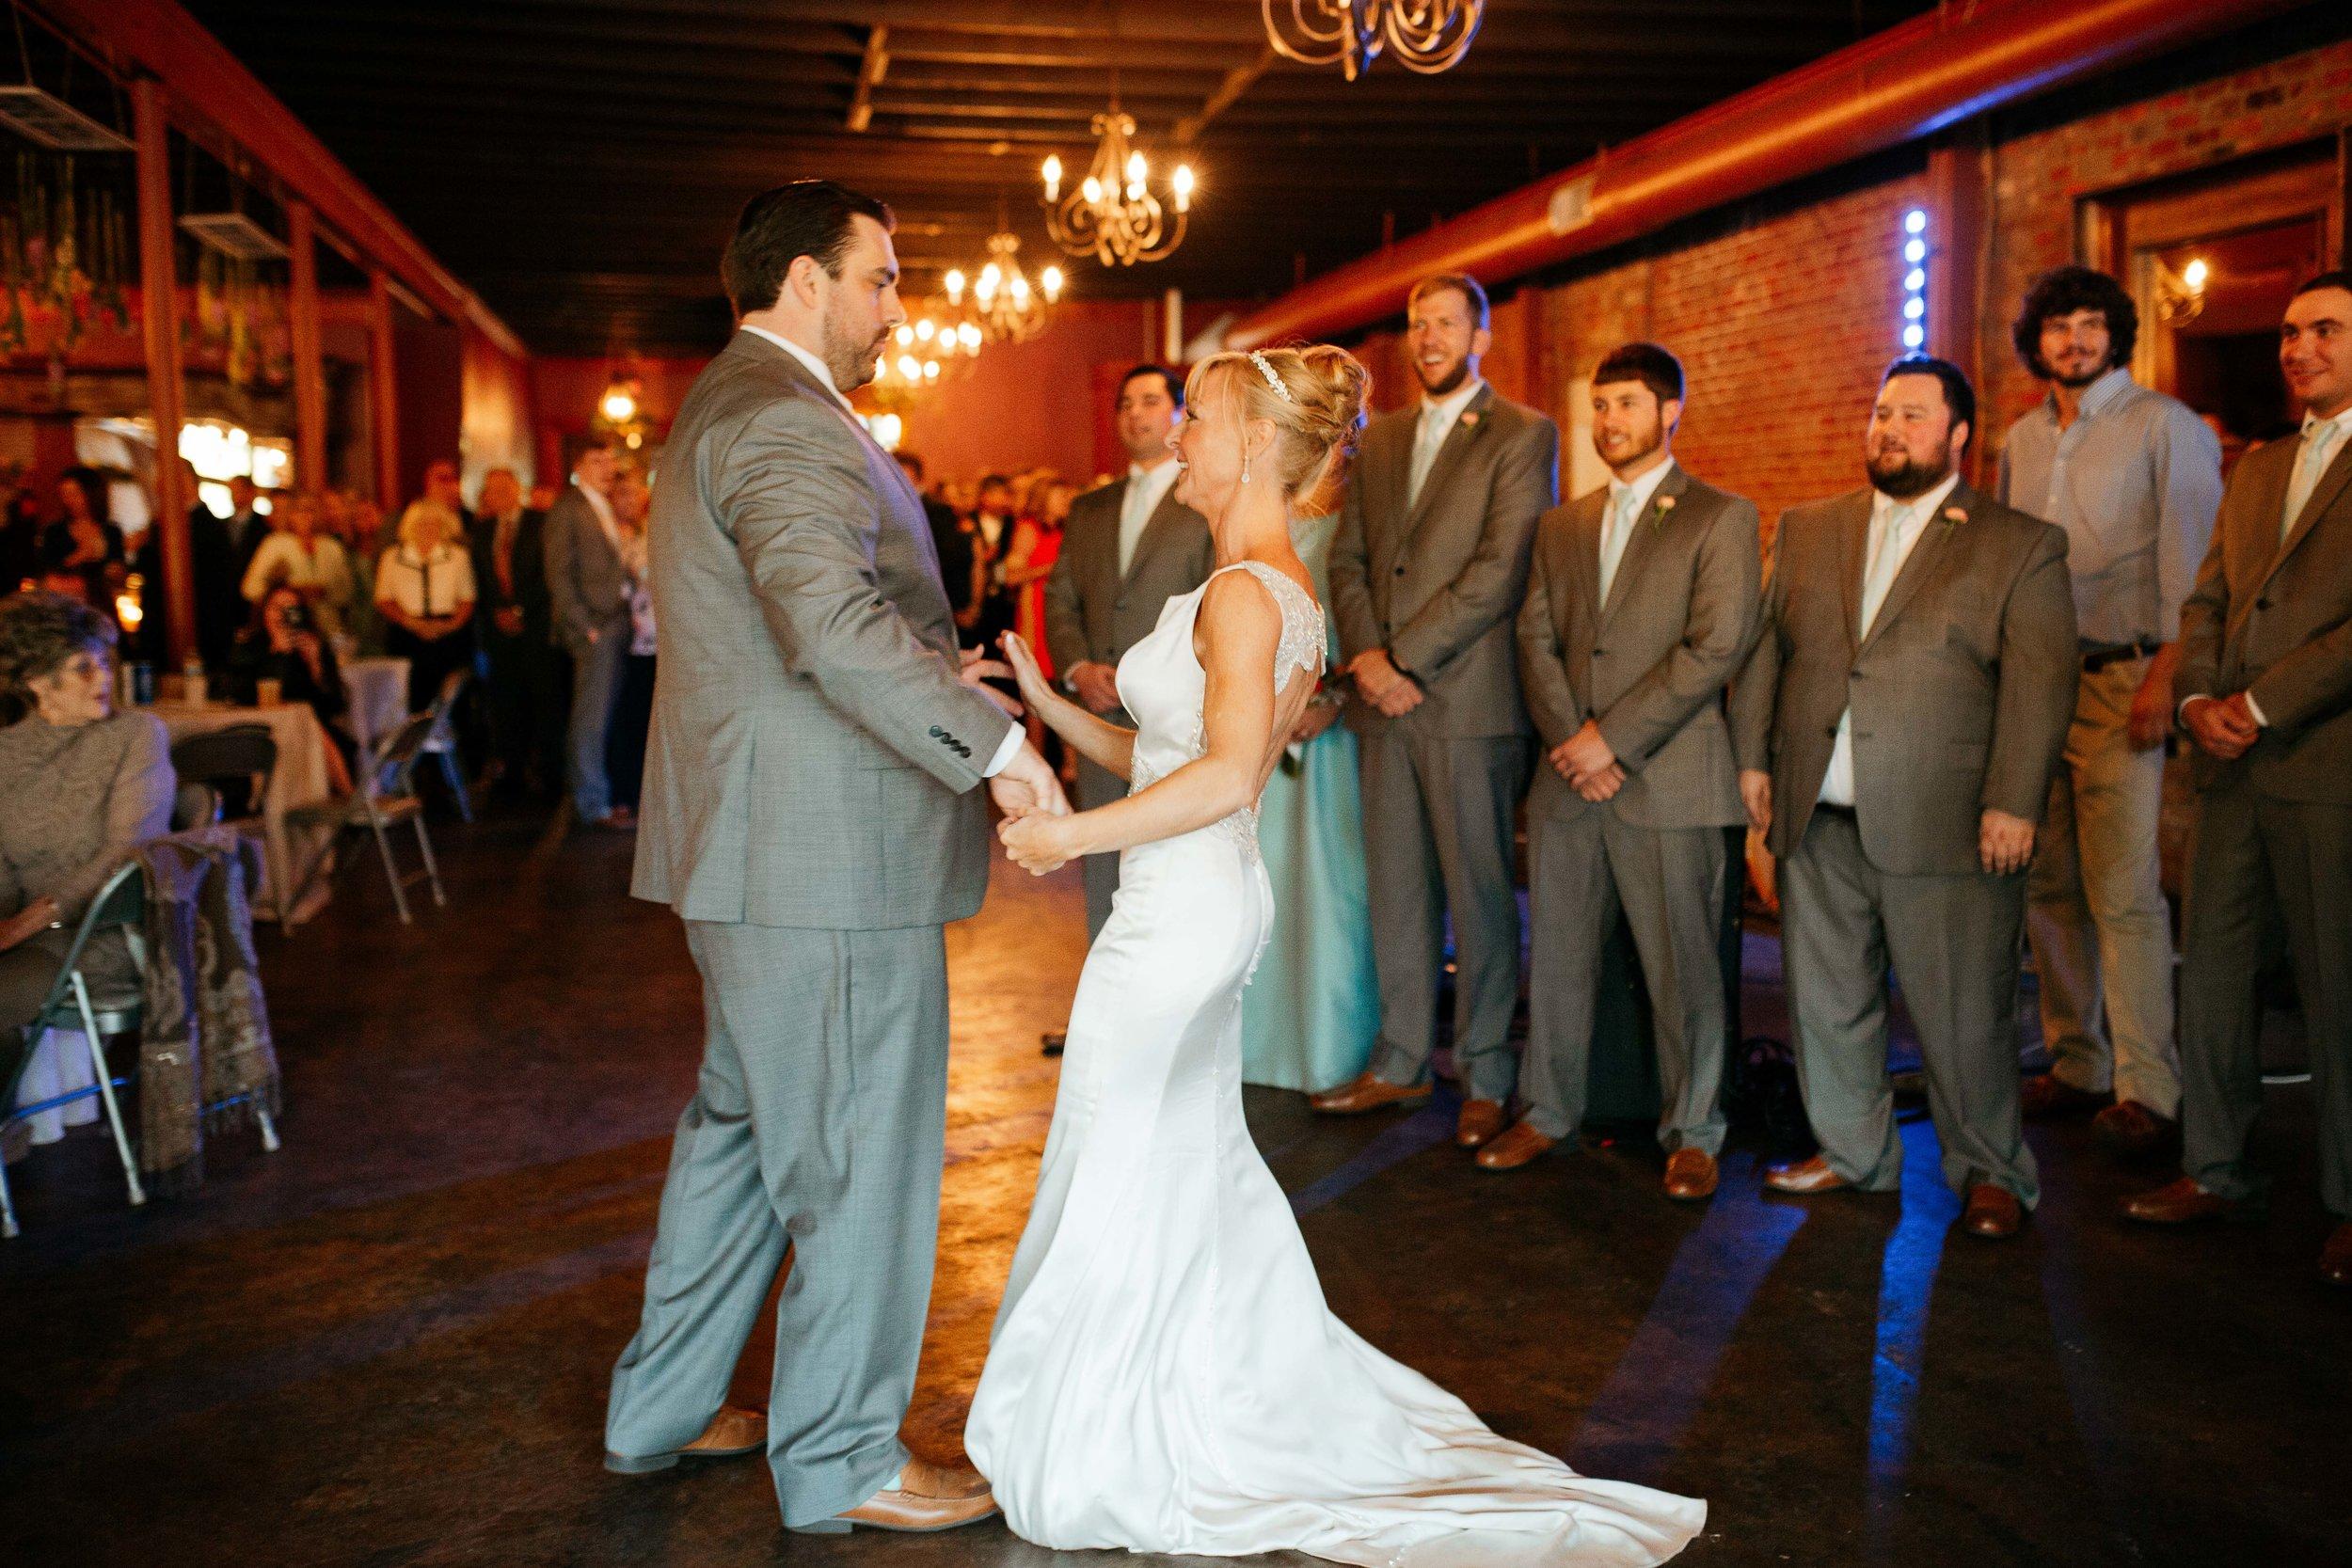 memphis tn wedding-189.jpg